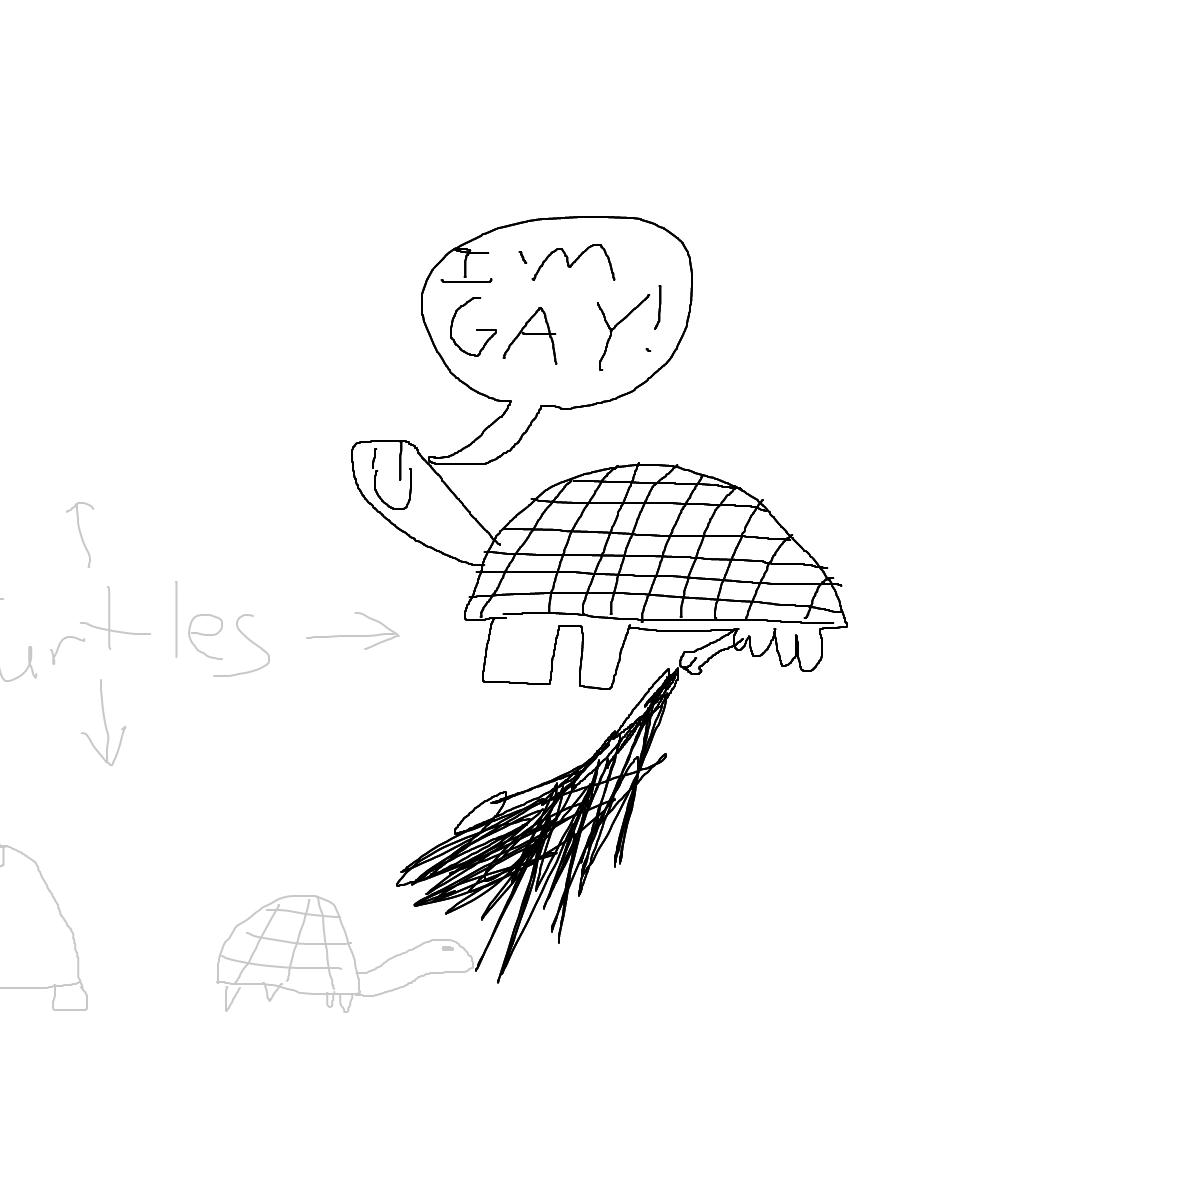 BAAAM drawing#23331 lat:-1.2386875152587890lng: -90.4036407470703100